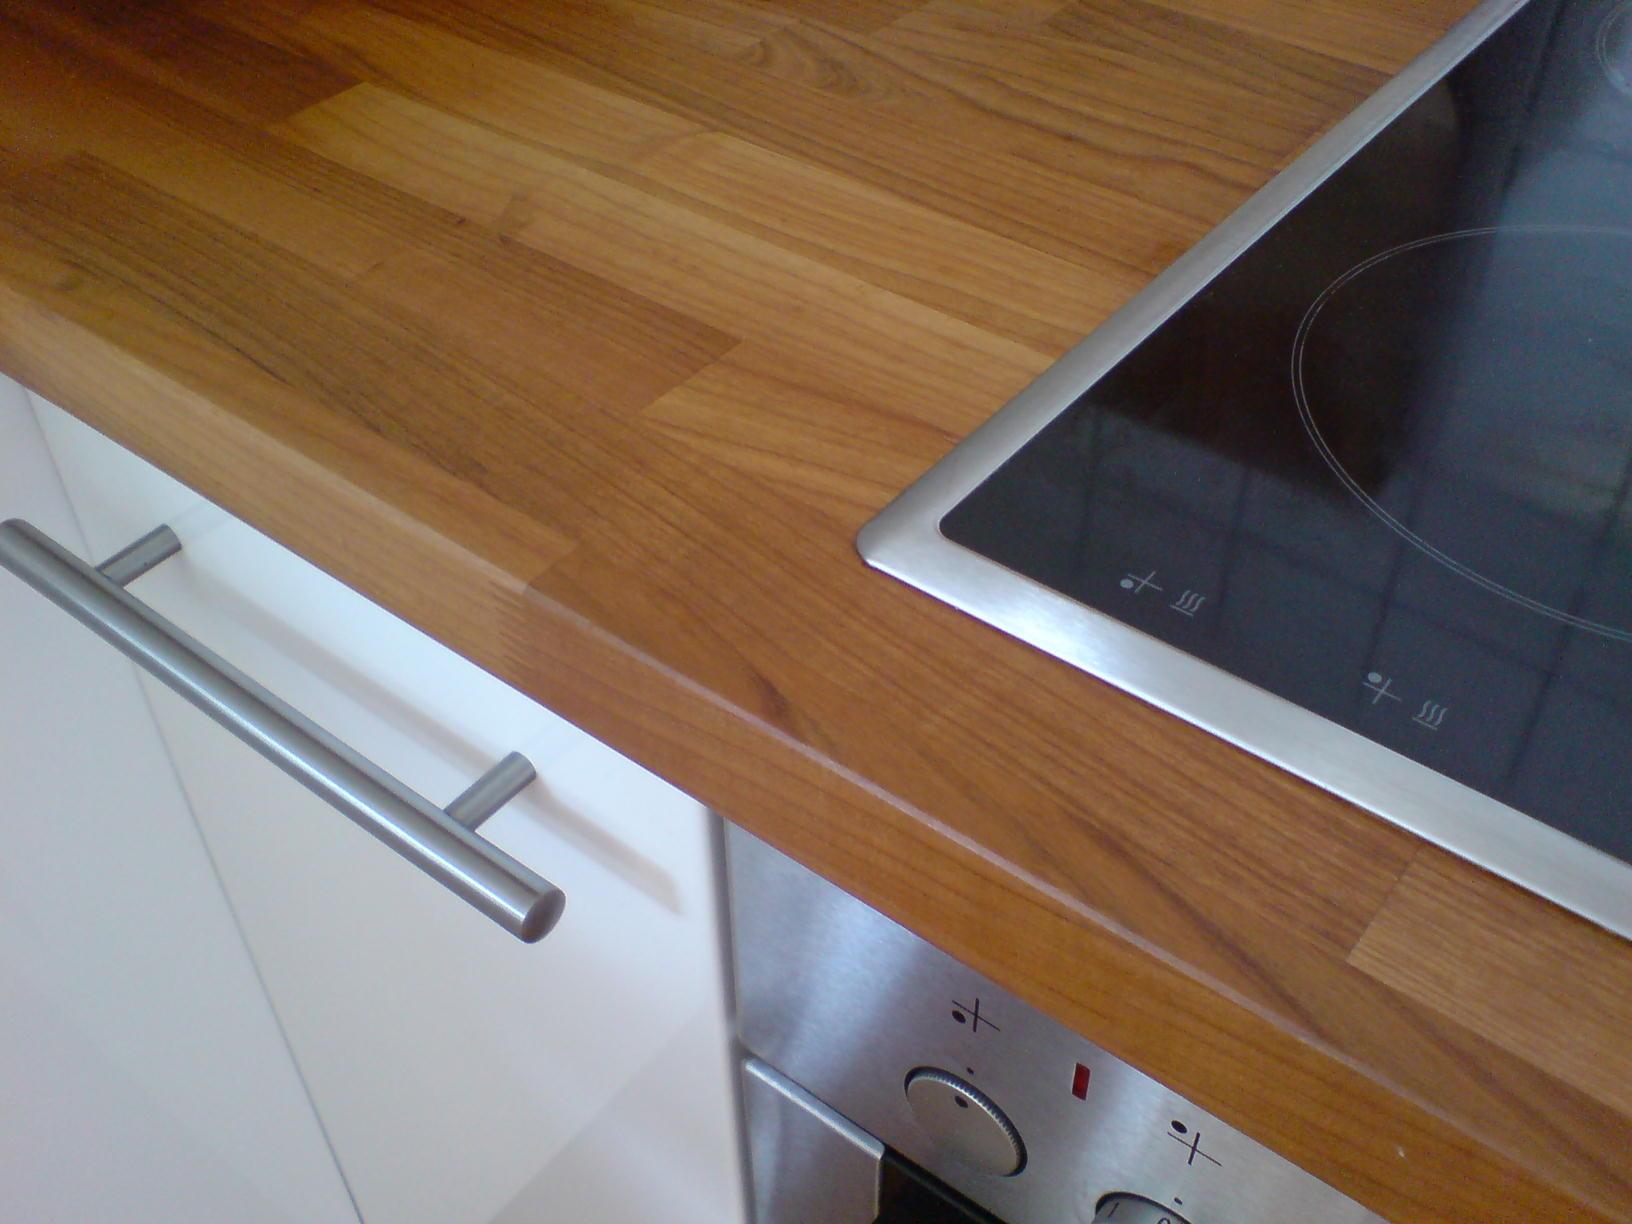 Kchenplatte Holz Great Holz Kuche Gros Kuchen Kuche